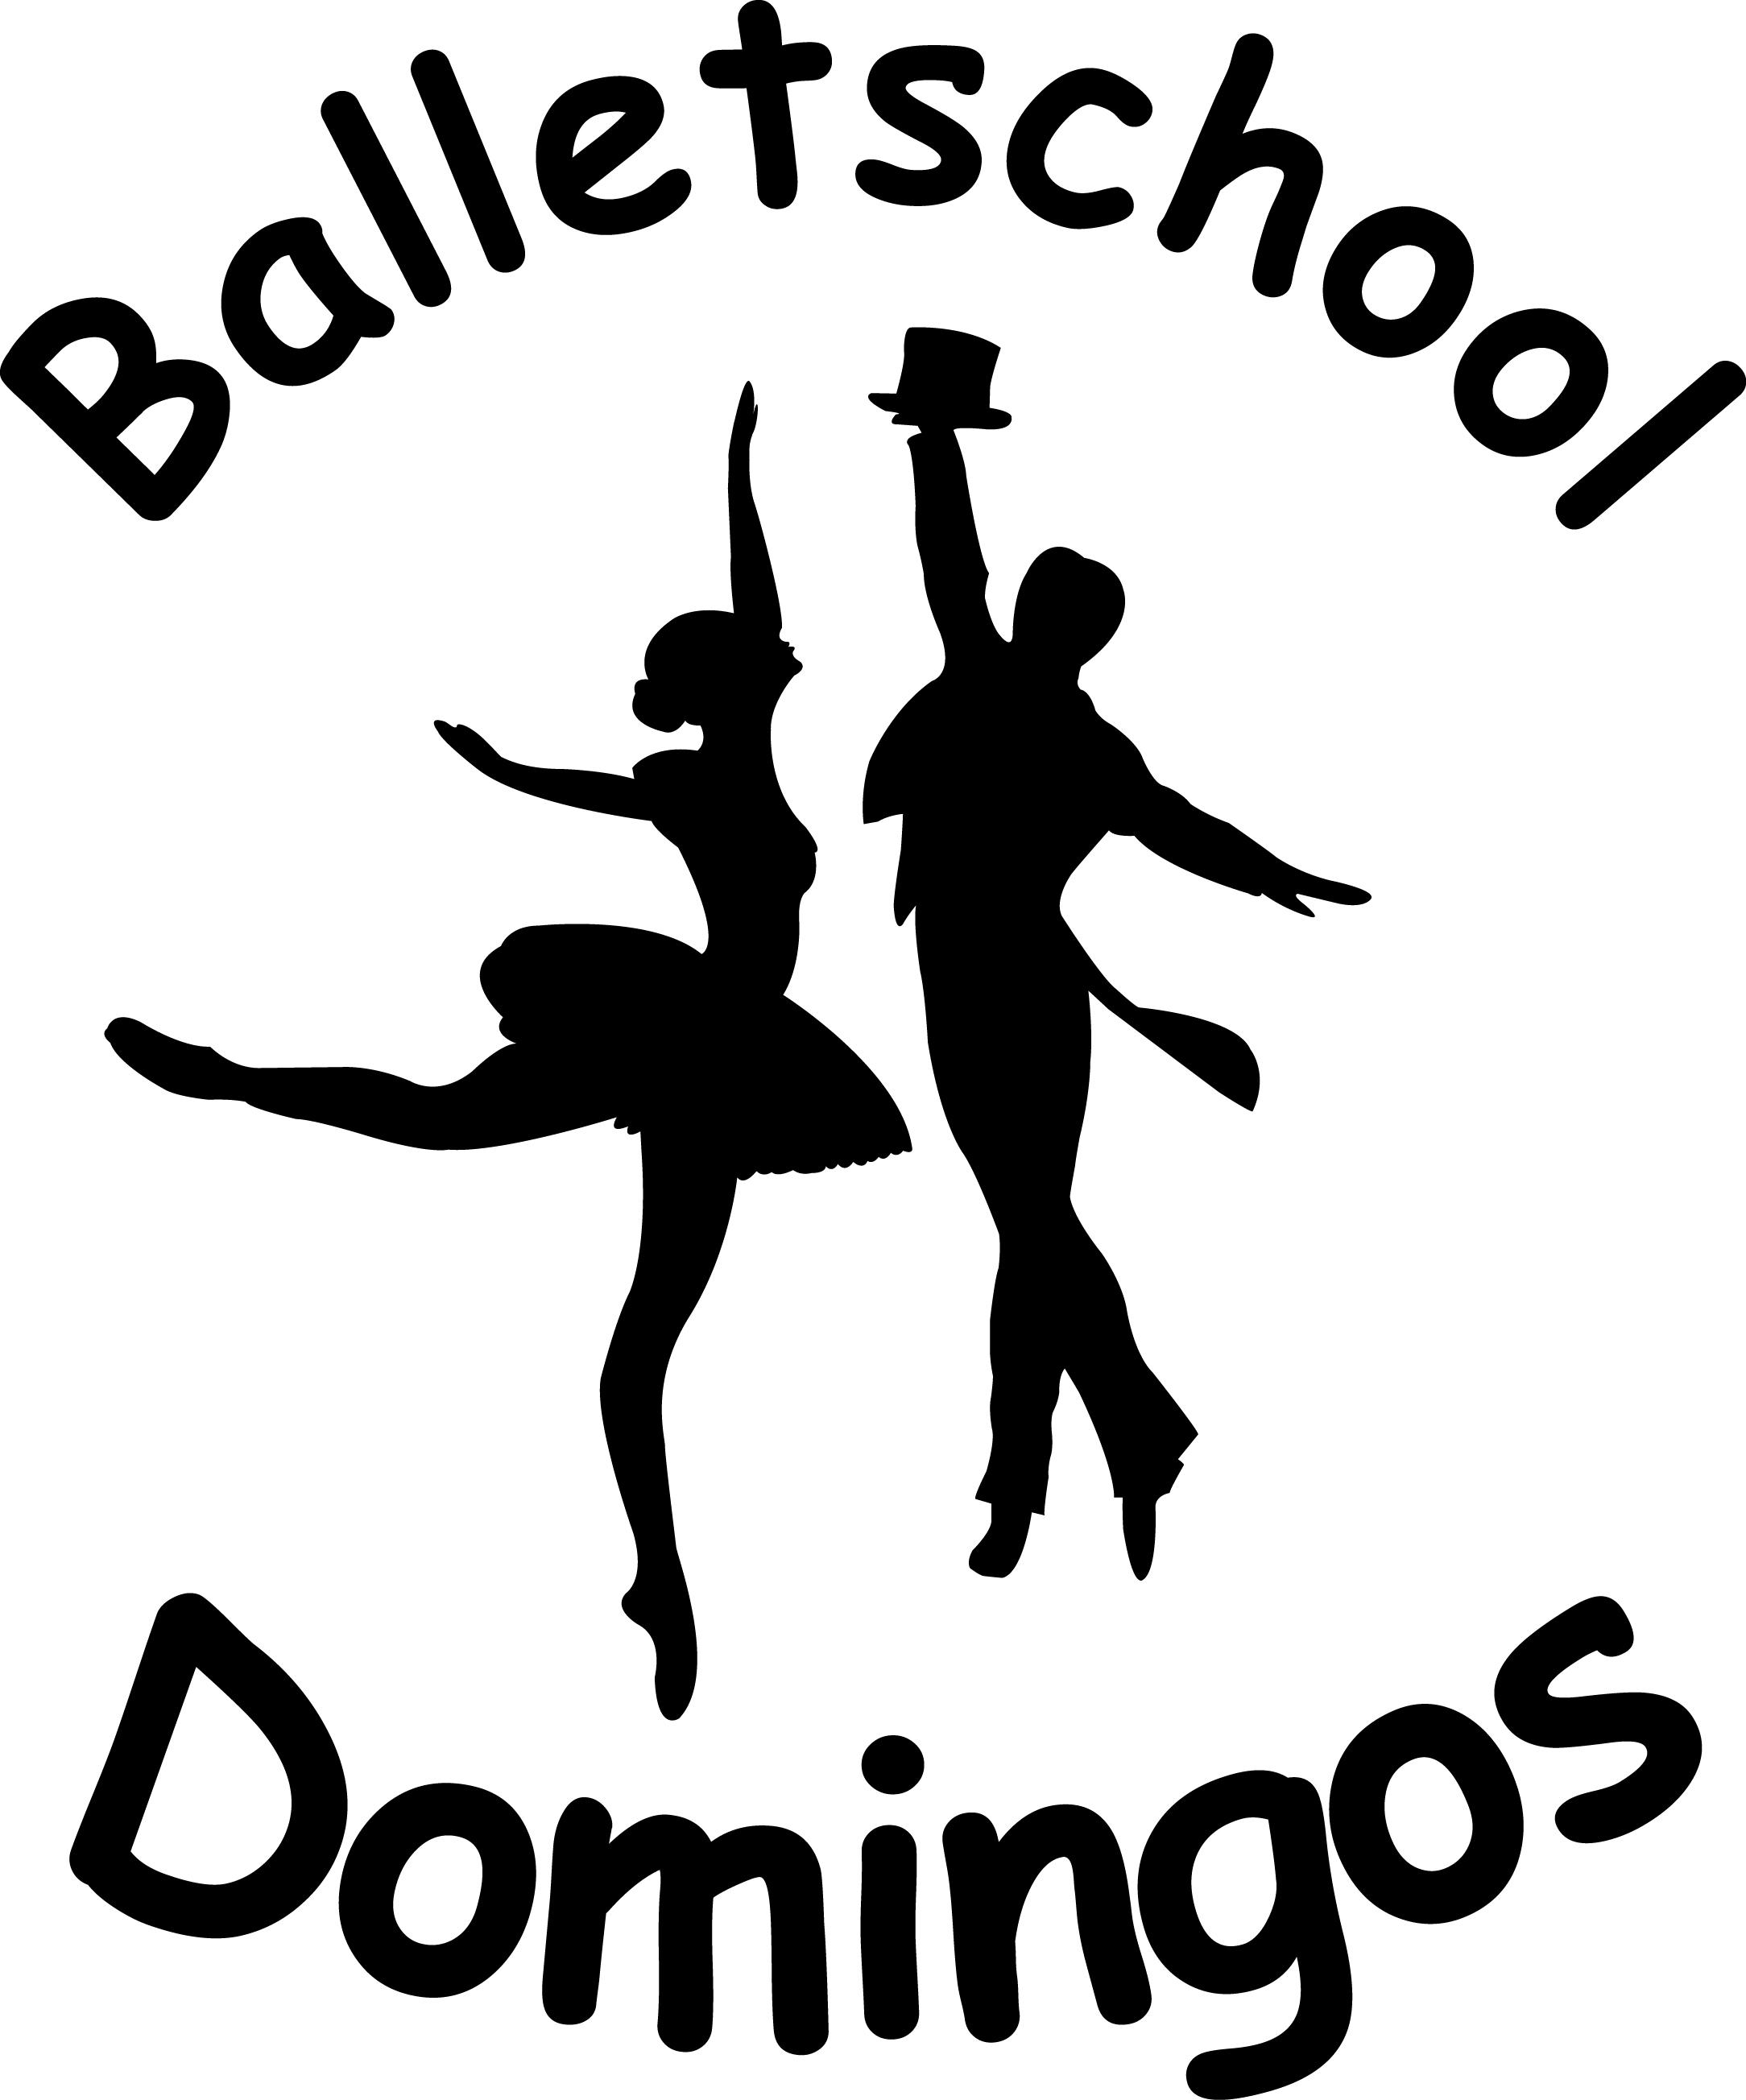 Balletschool Domingos